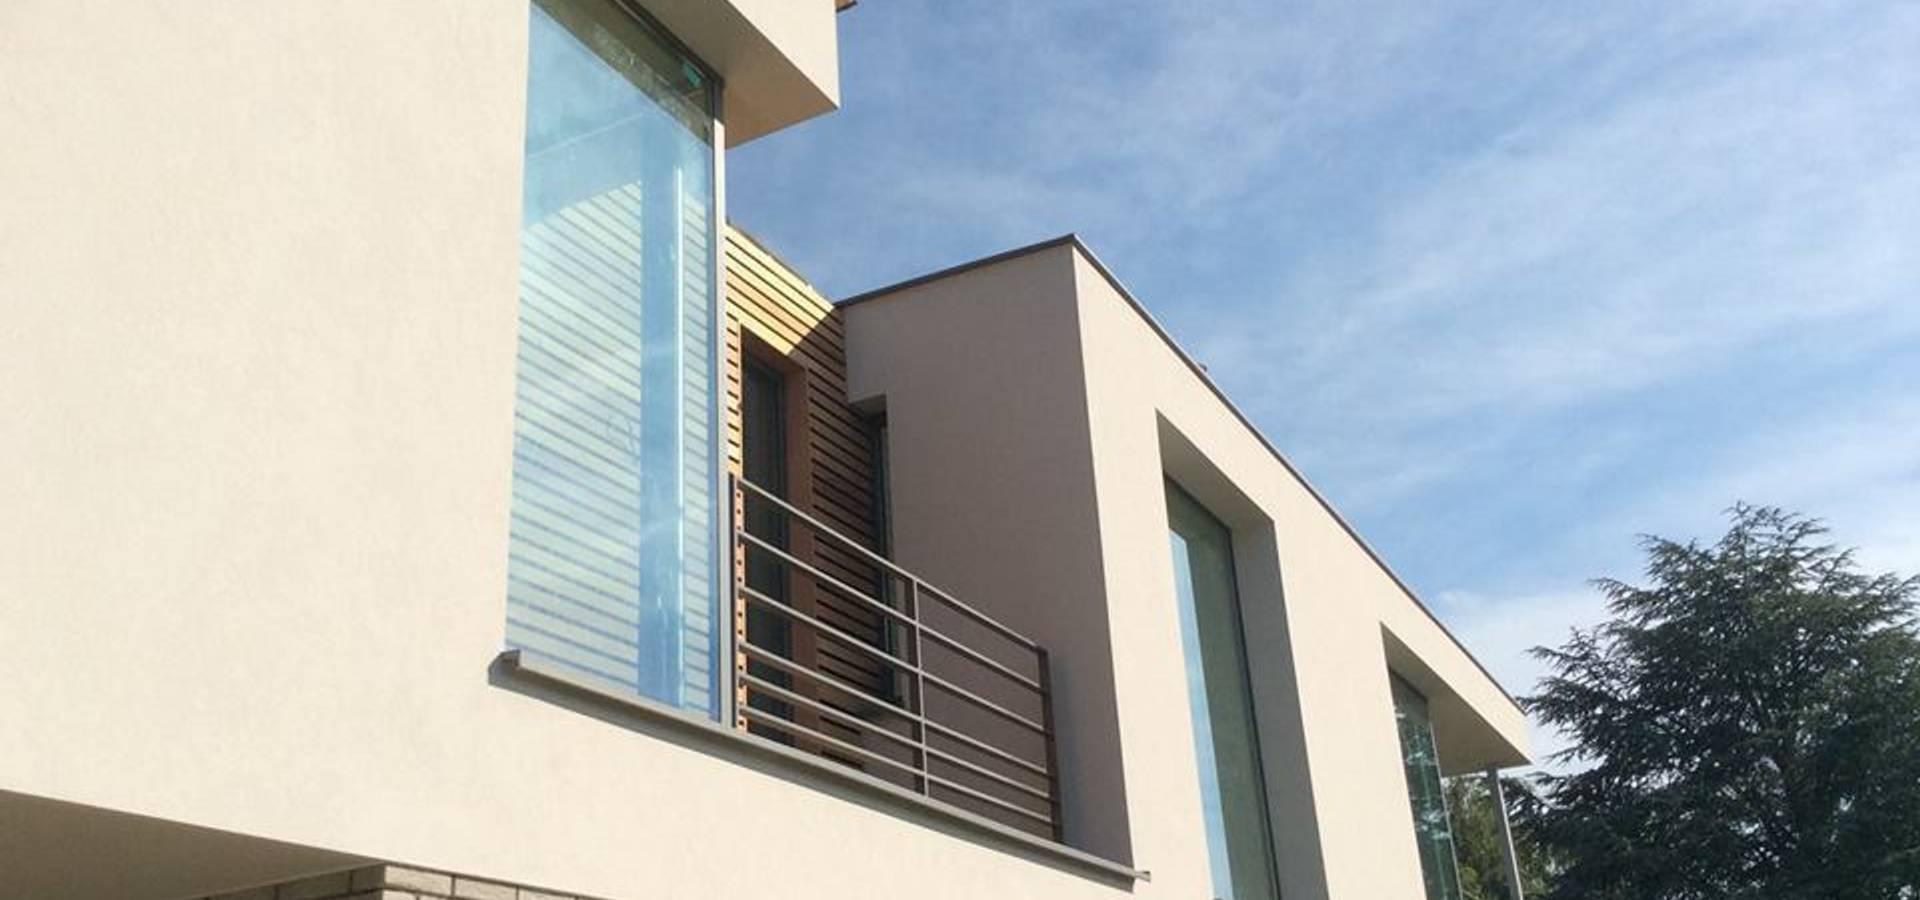 sechehaye architecture et design suarl e i extension d. Black Bedroom Furniture Sets. Home Design Ideas